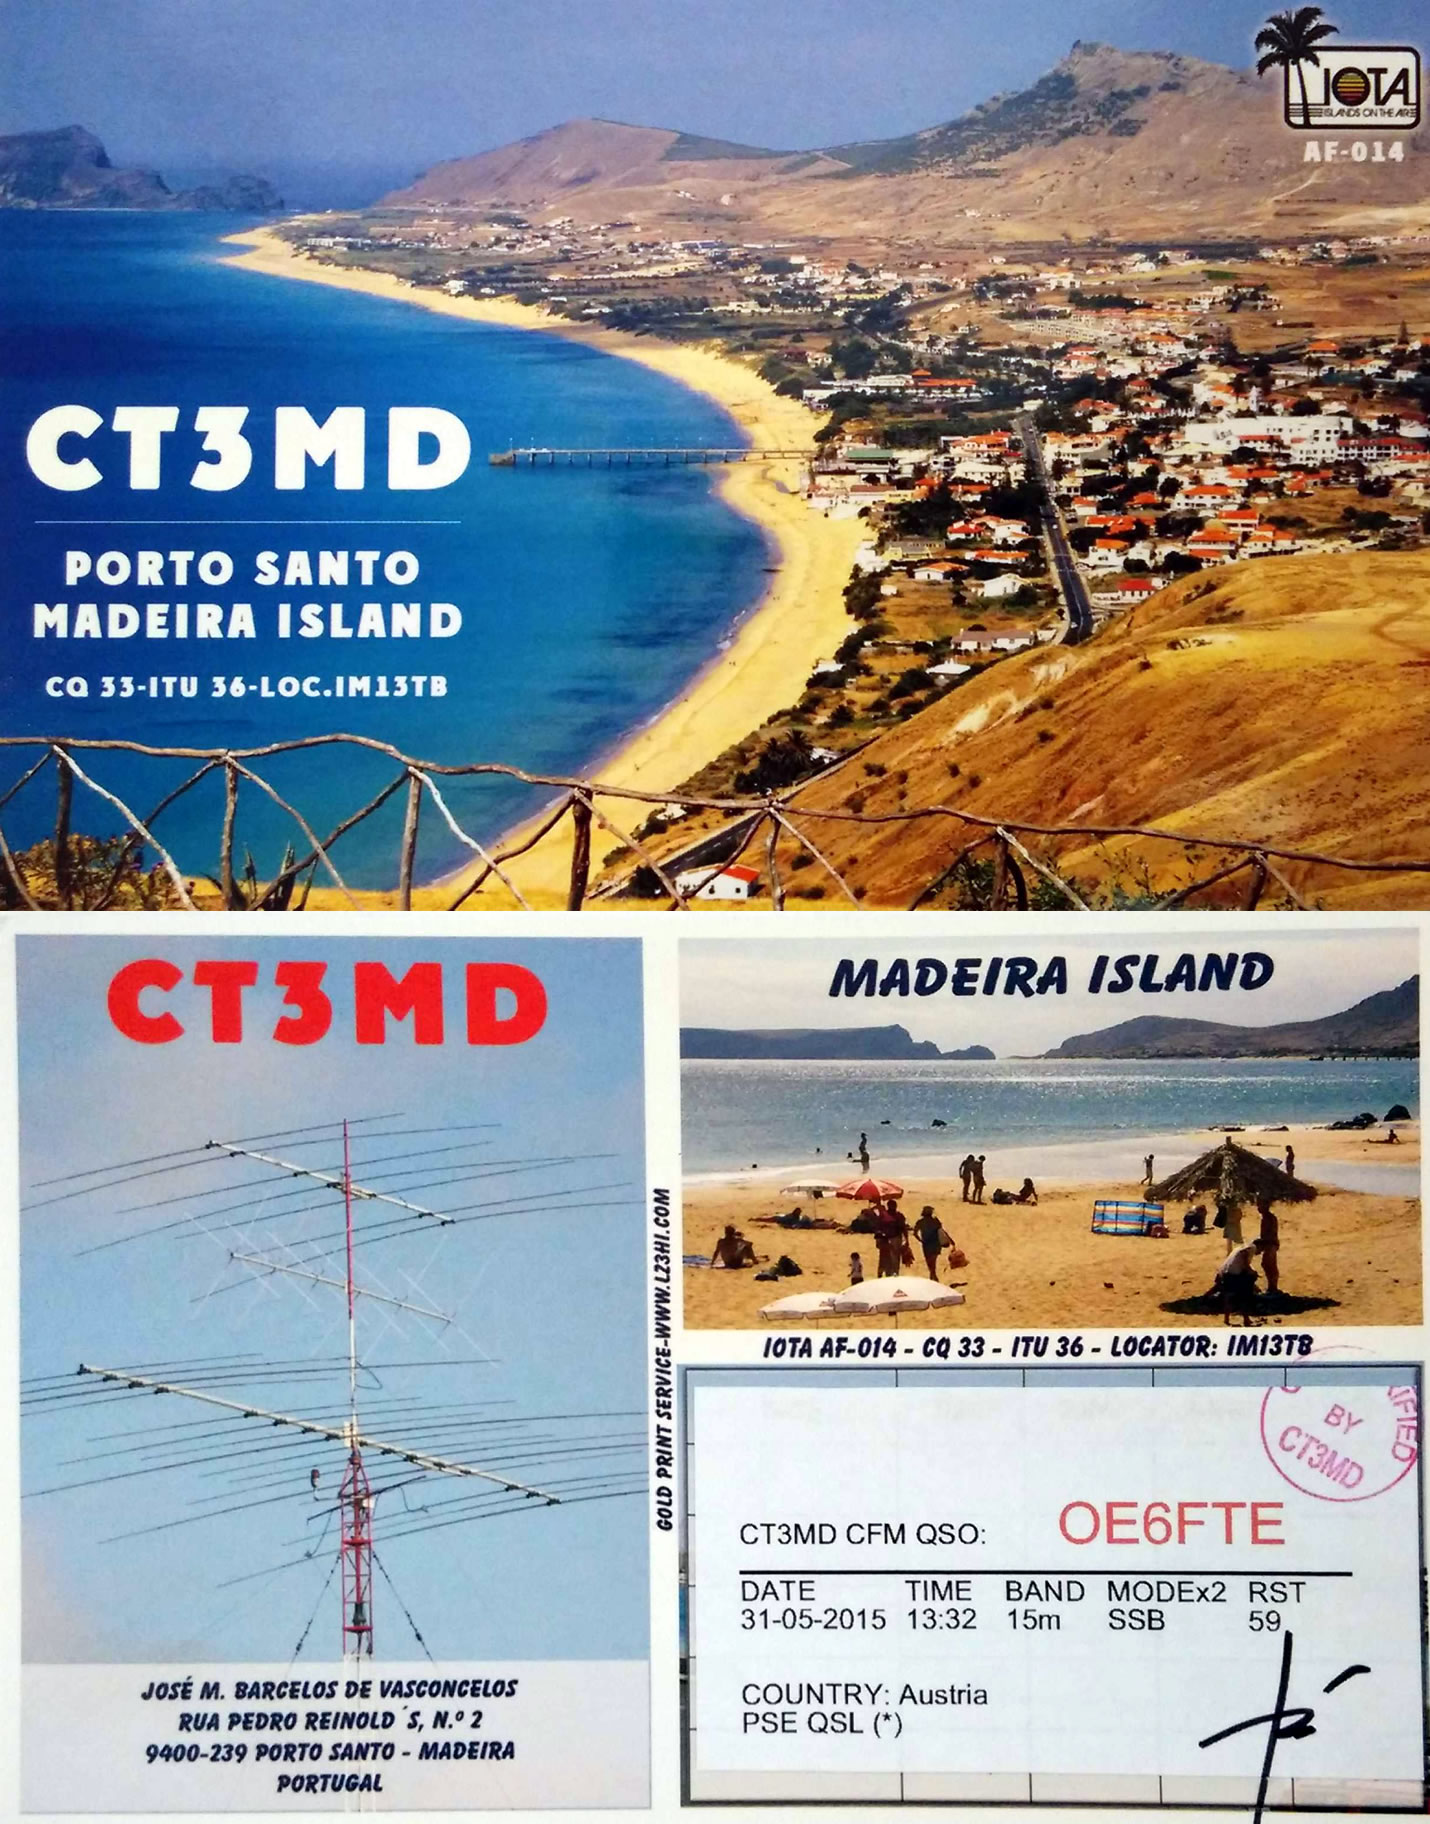 CT3MD